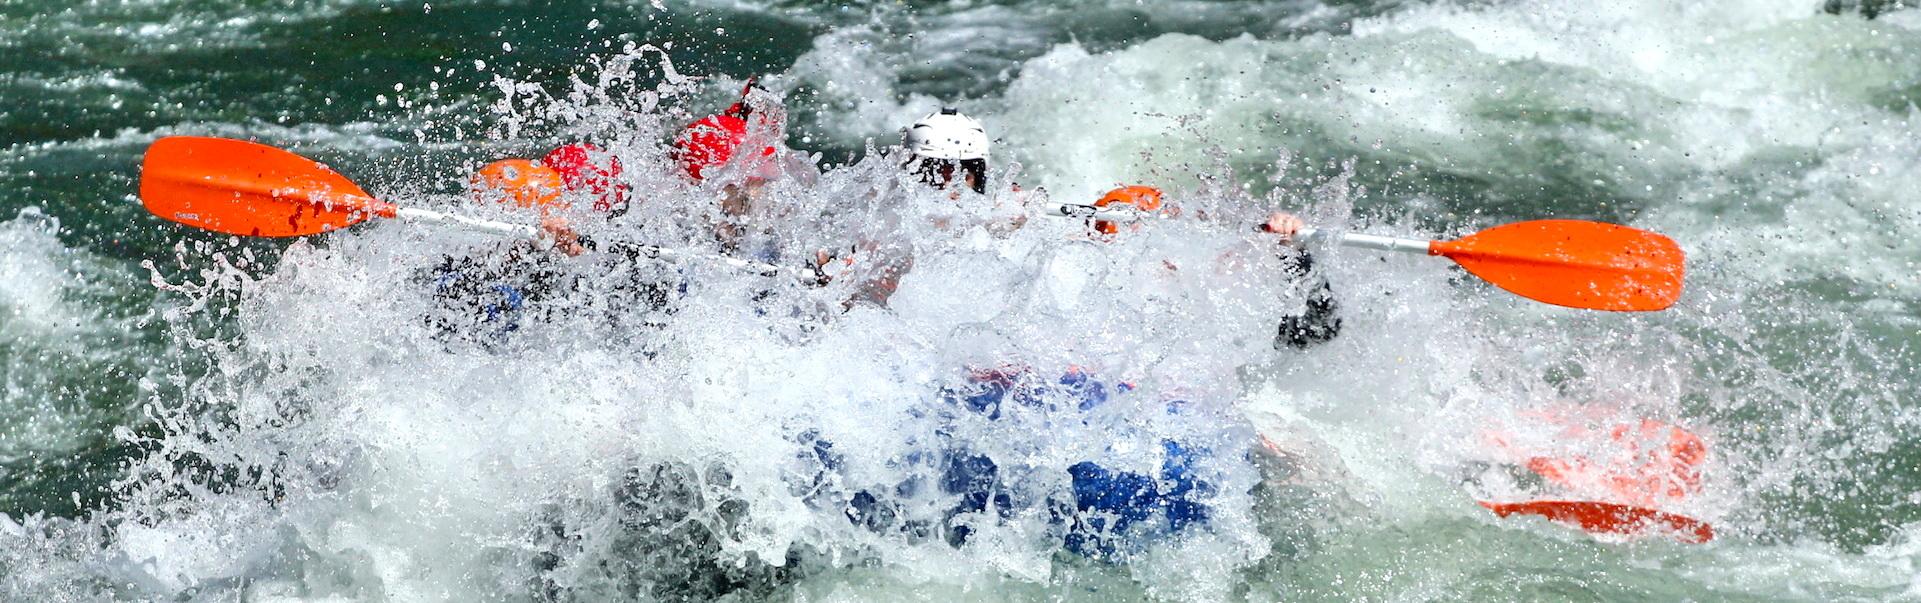 Temporada Rafting 2017